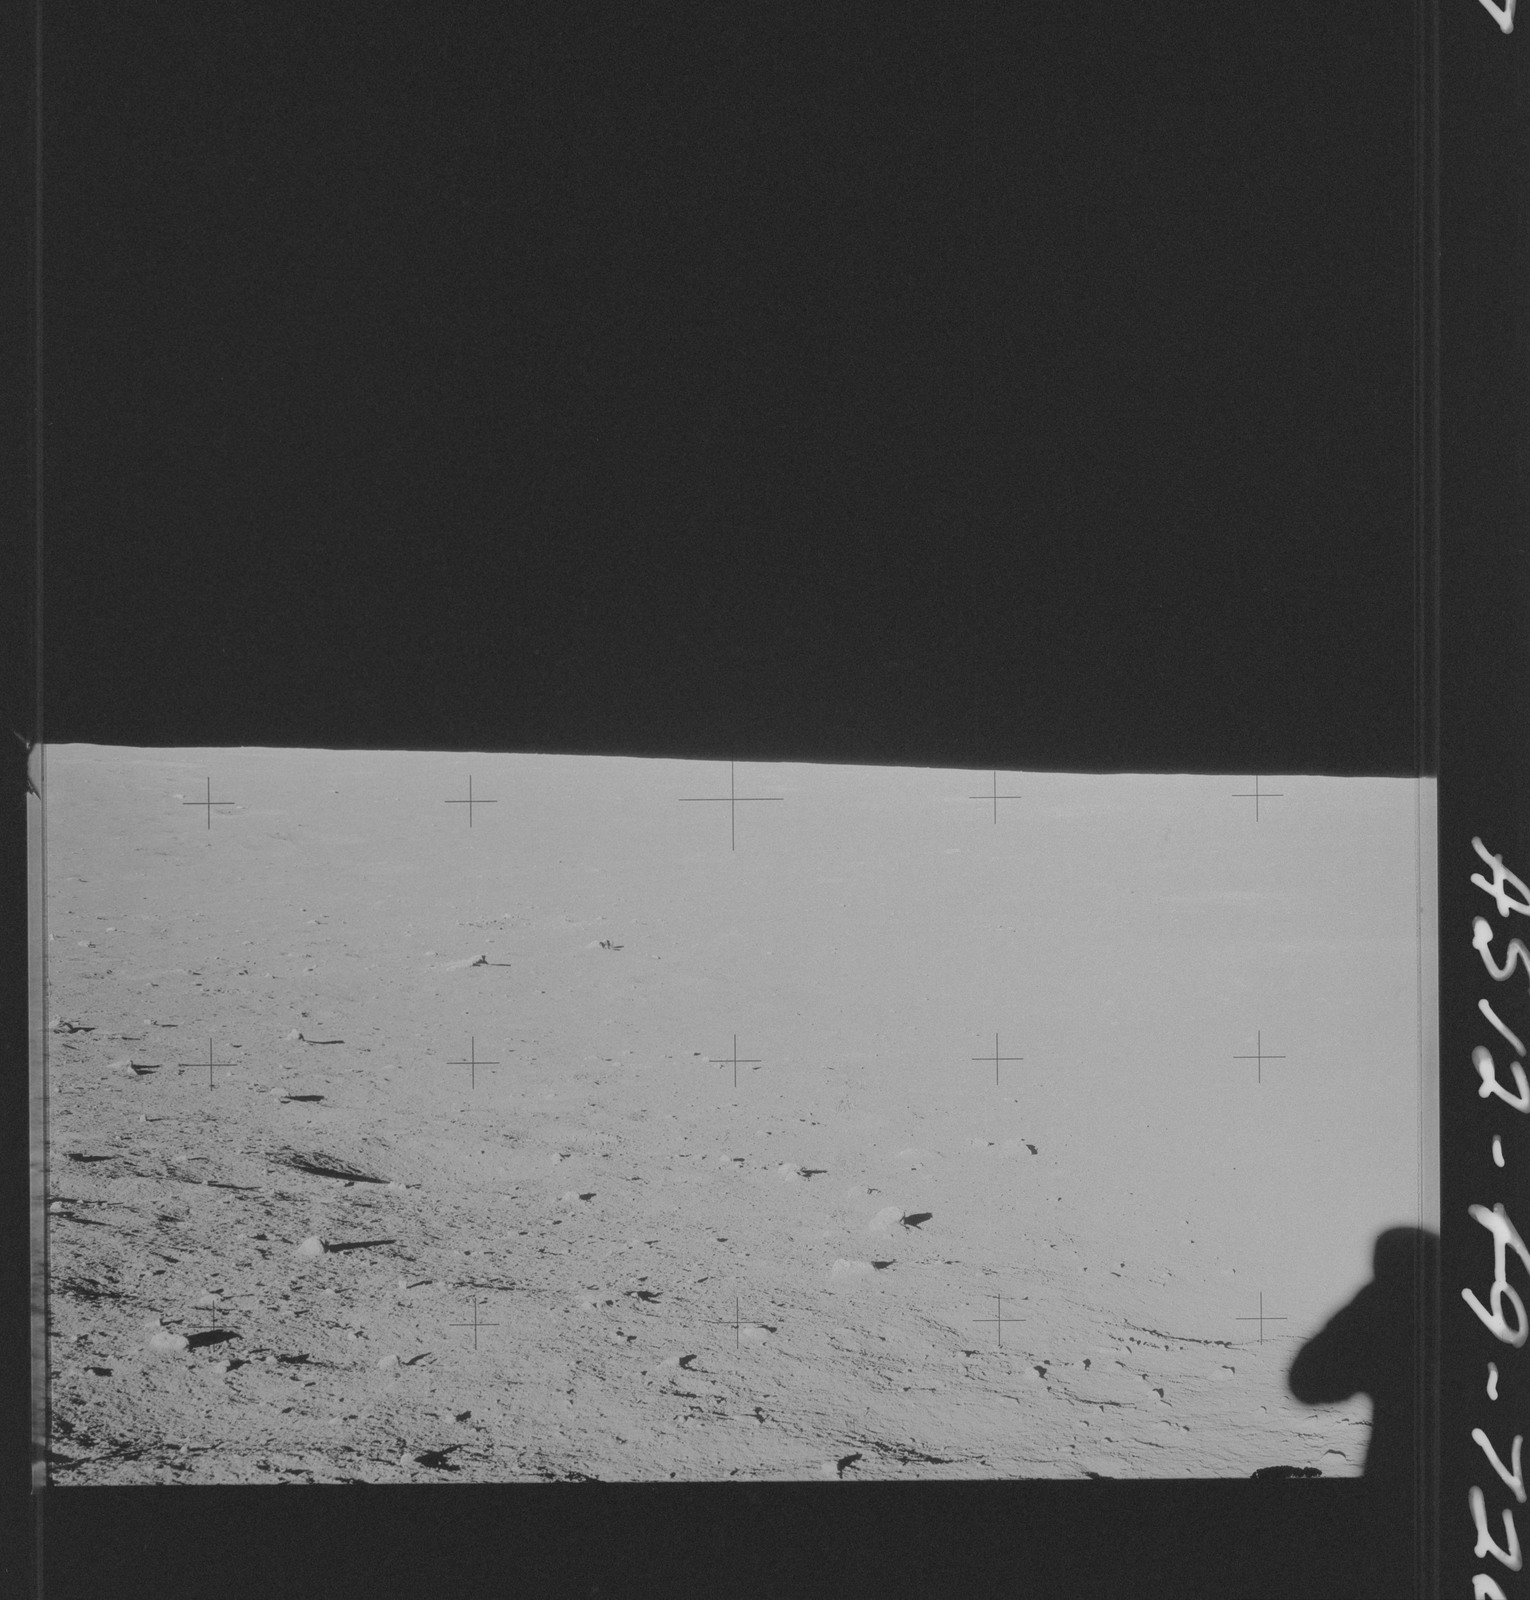 AS12-49-7206 - Apollo 12 - Apollo 12 Mission image  - Lunar Surface